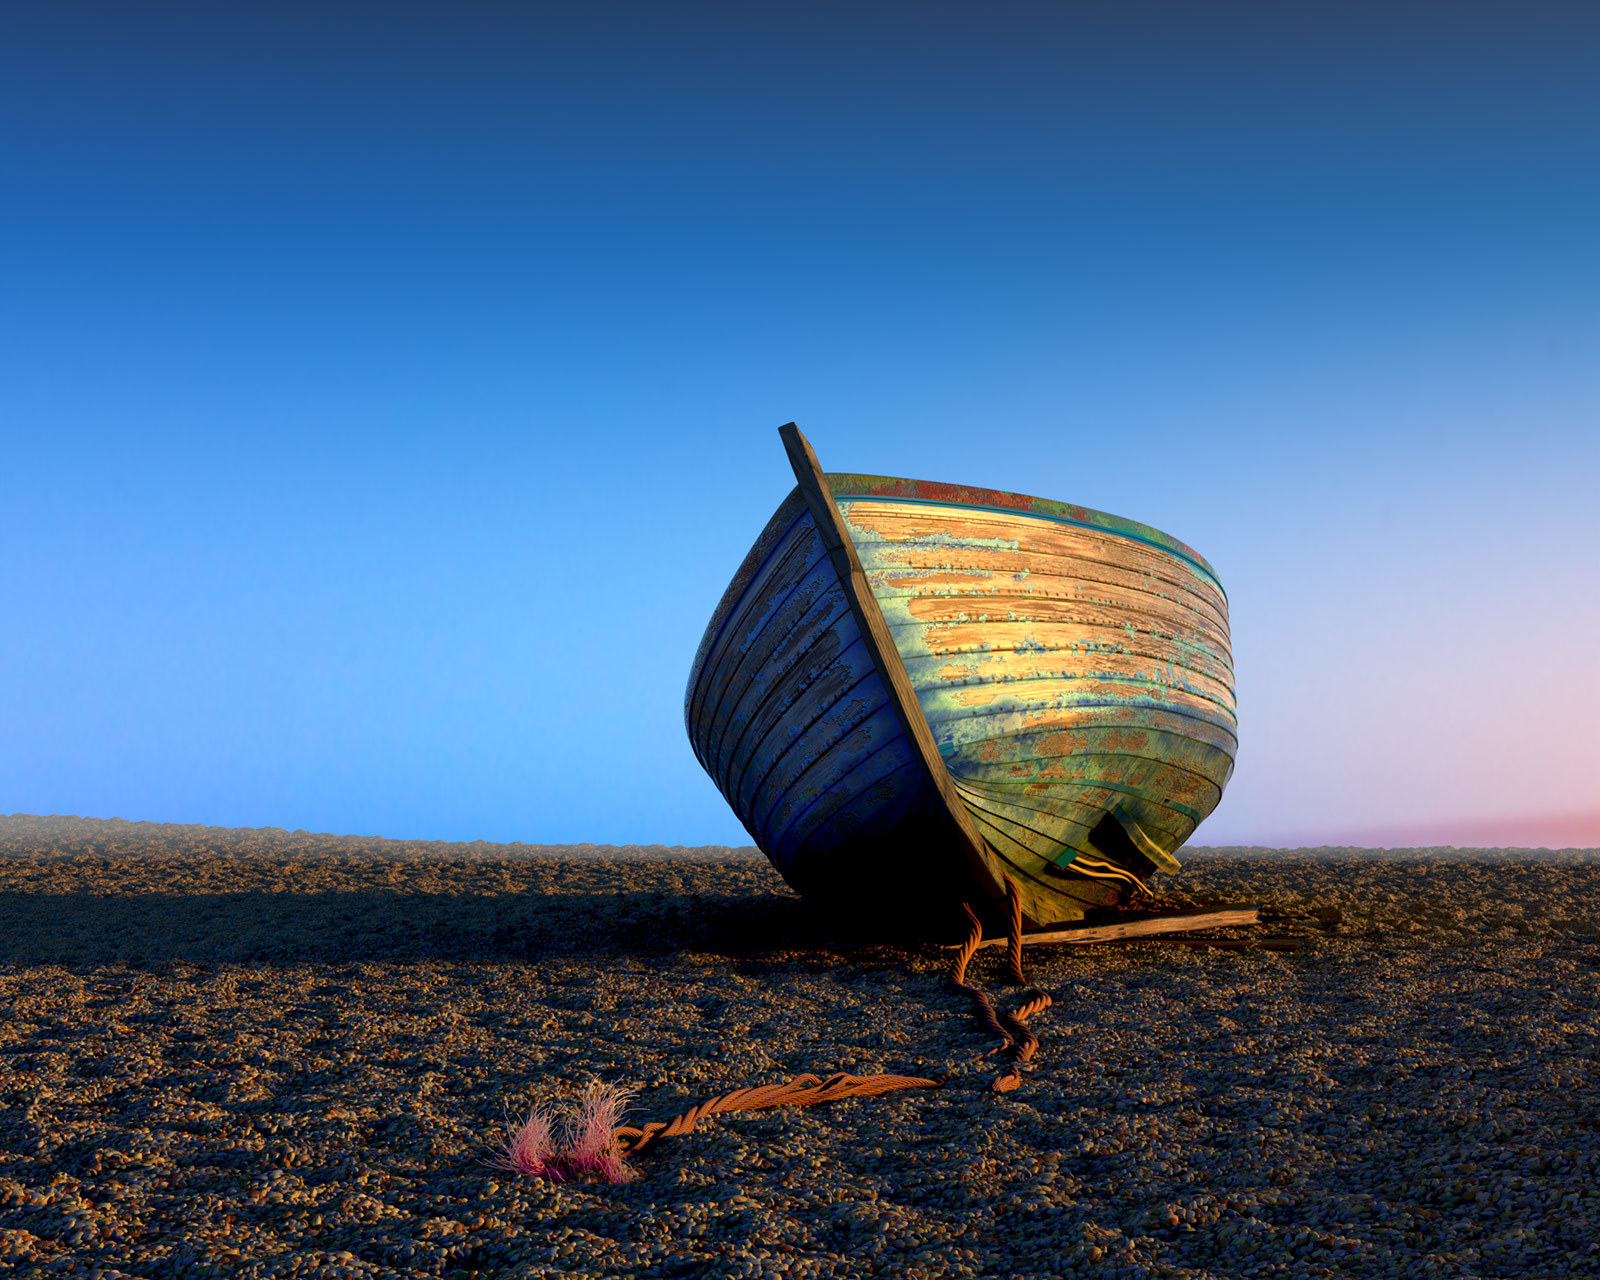 Boat on the beach by John Bavaresco